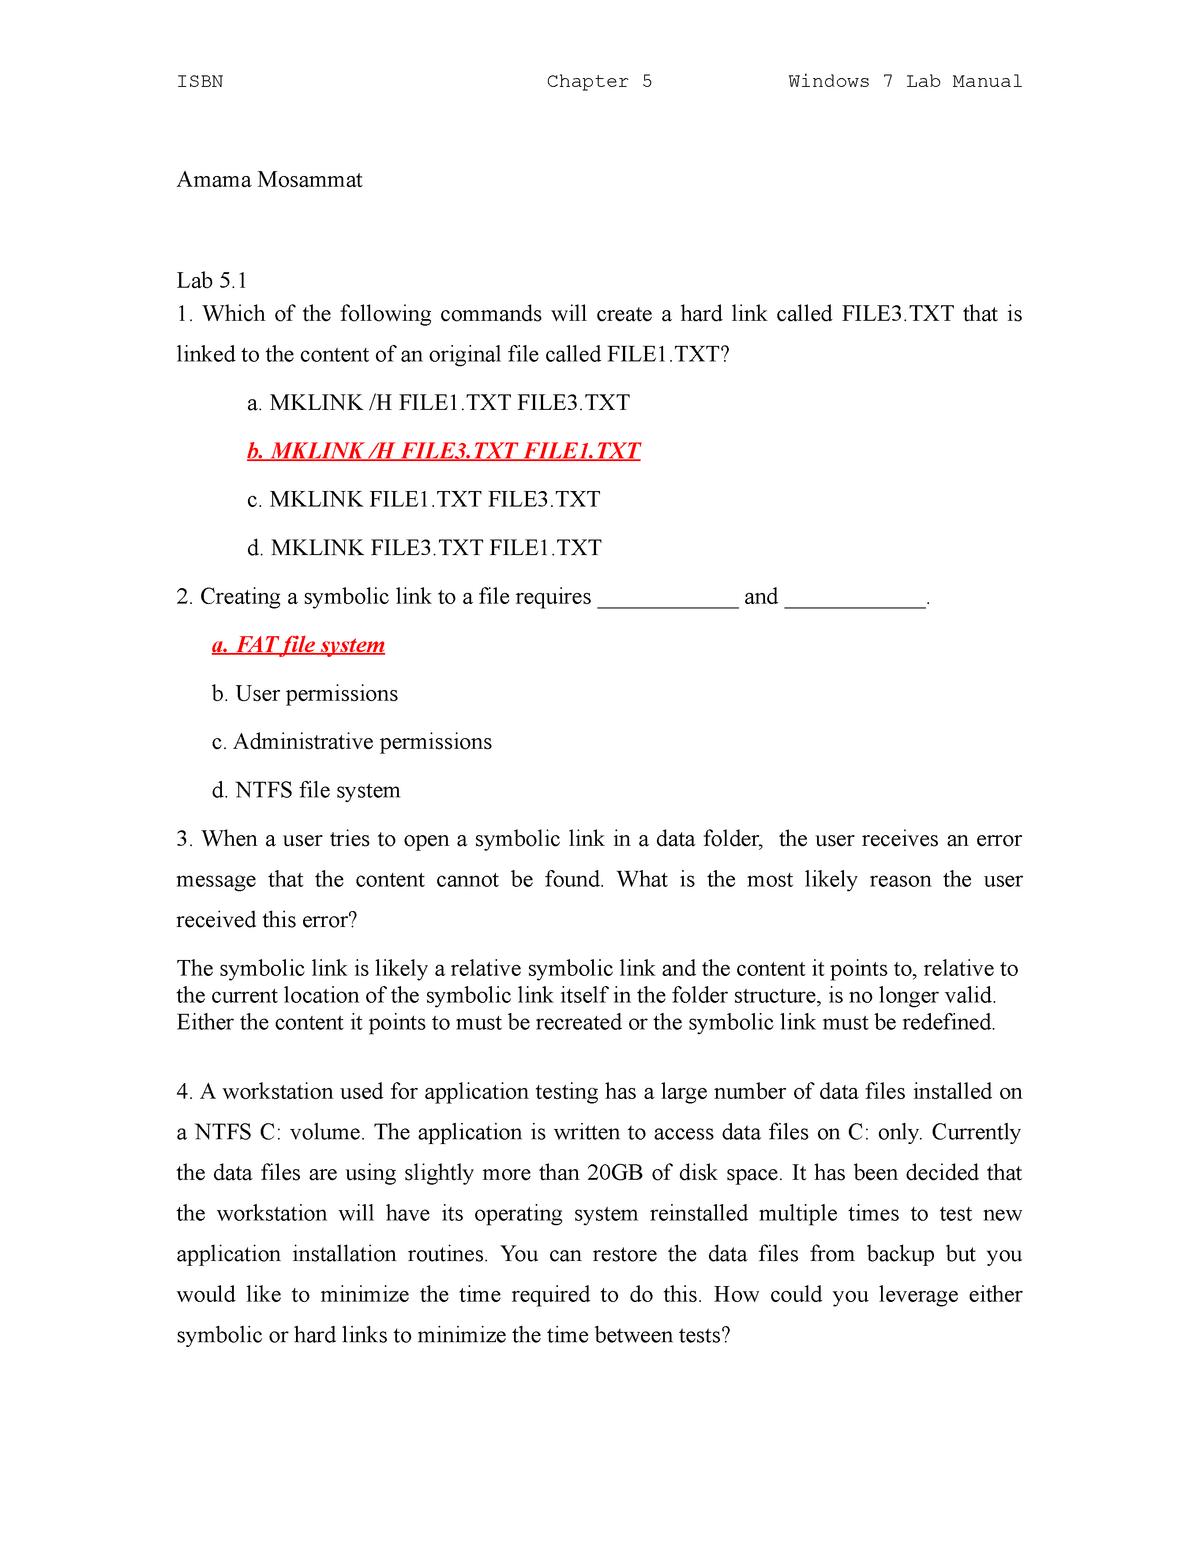 Chapter 5 Assignment - Quiz - CIS 445 - BMCC - StuDocu